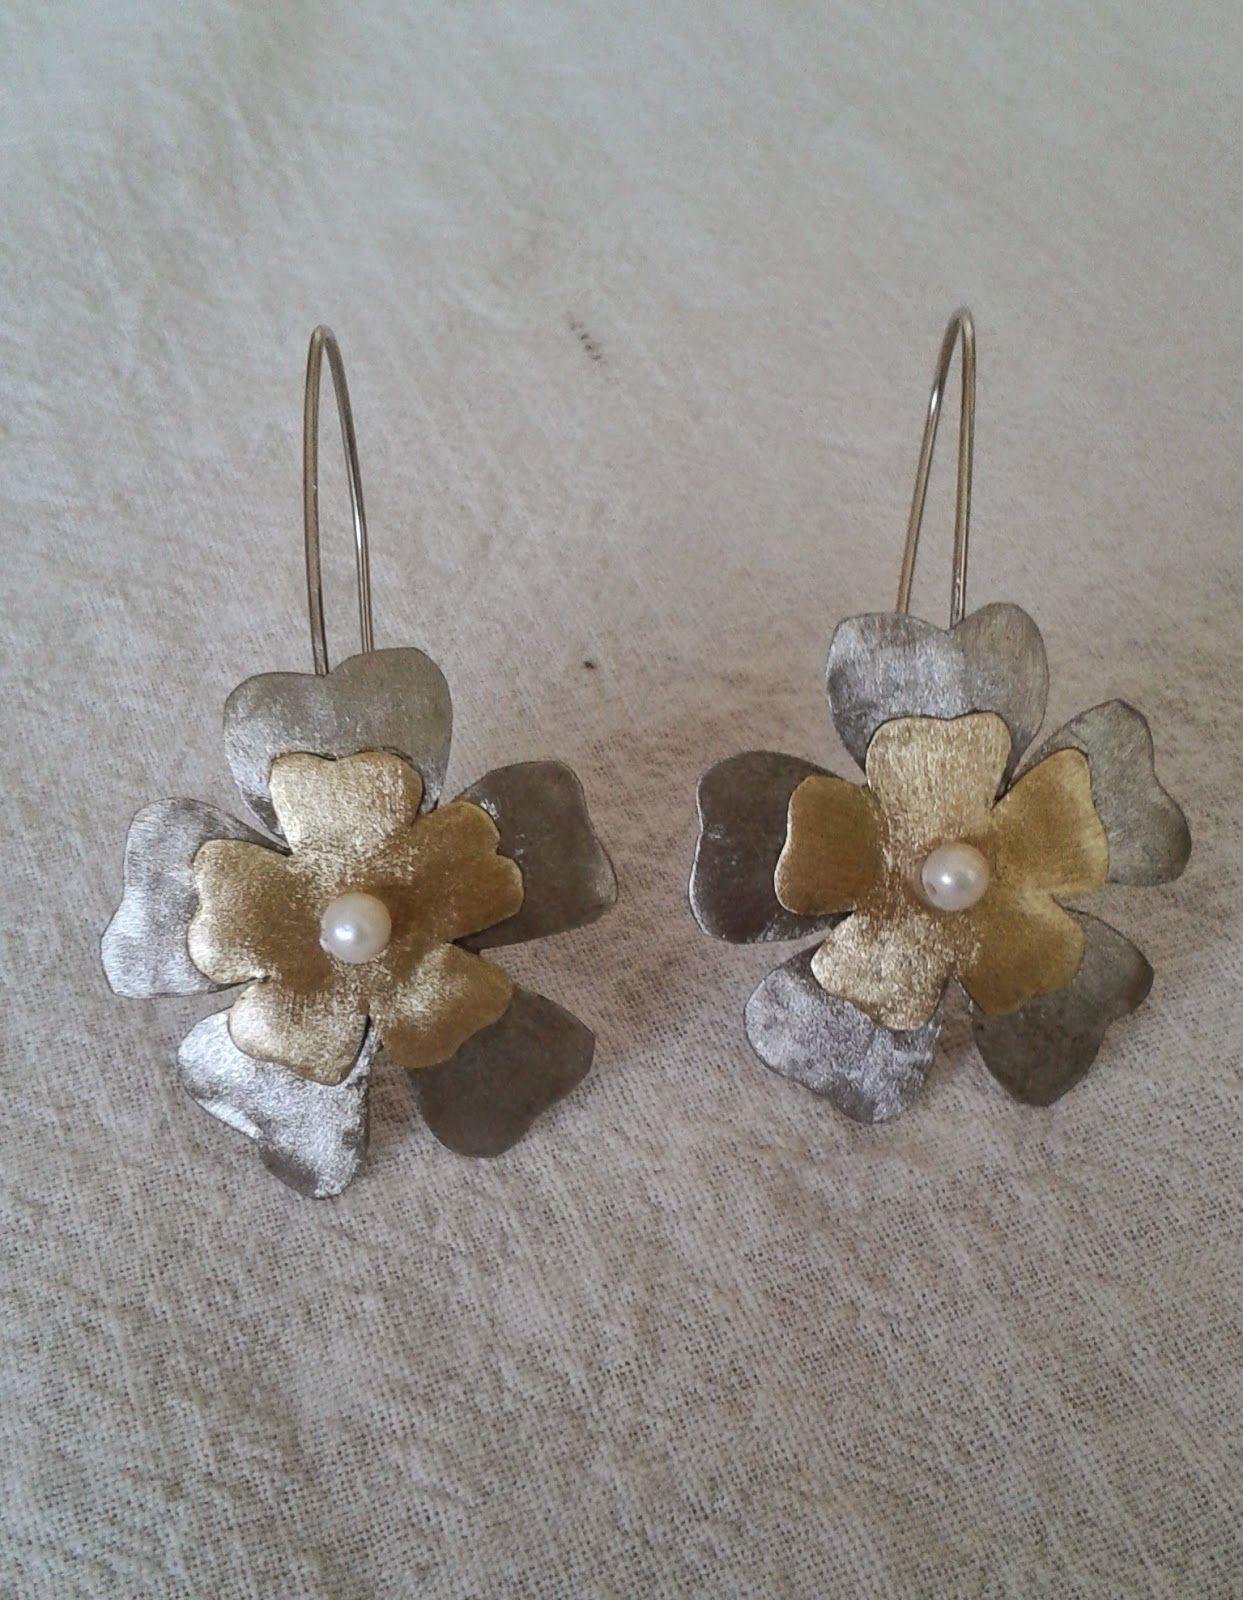 908589b22cb χειροποίητα,κοσμήματα,σκουλαρίκια,δαχτυλίδια,κολιέ,αλπακάς ...